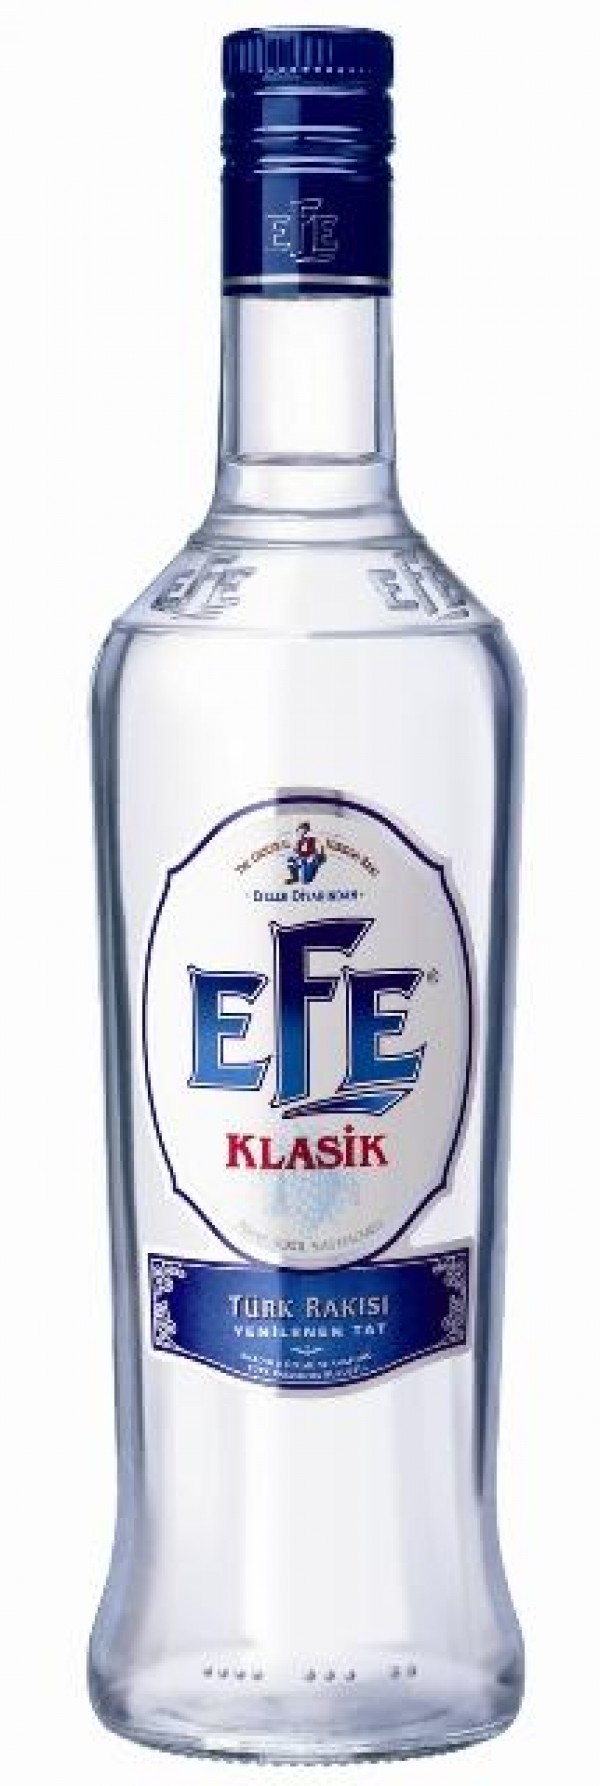 Efe Raki Blue Classic